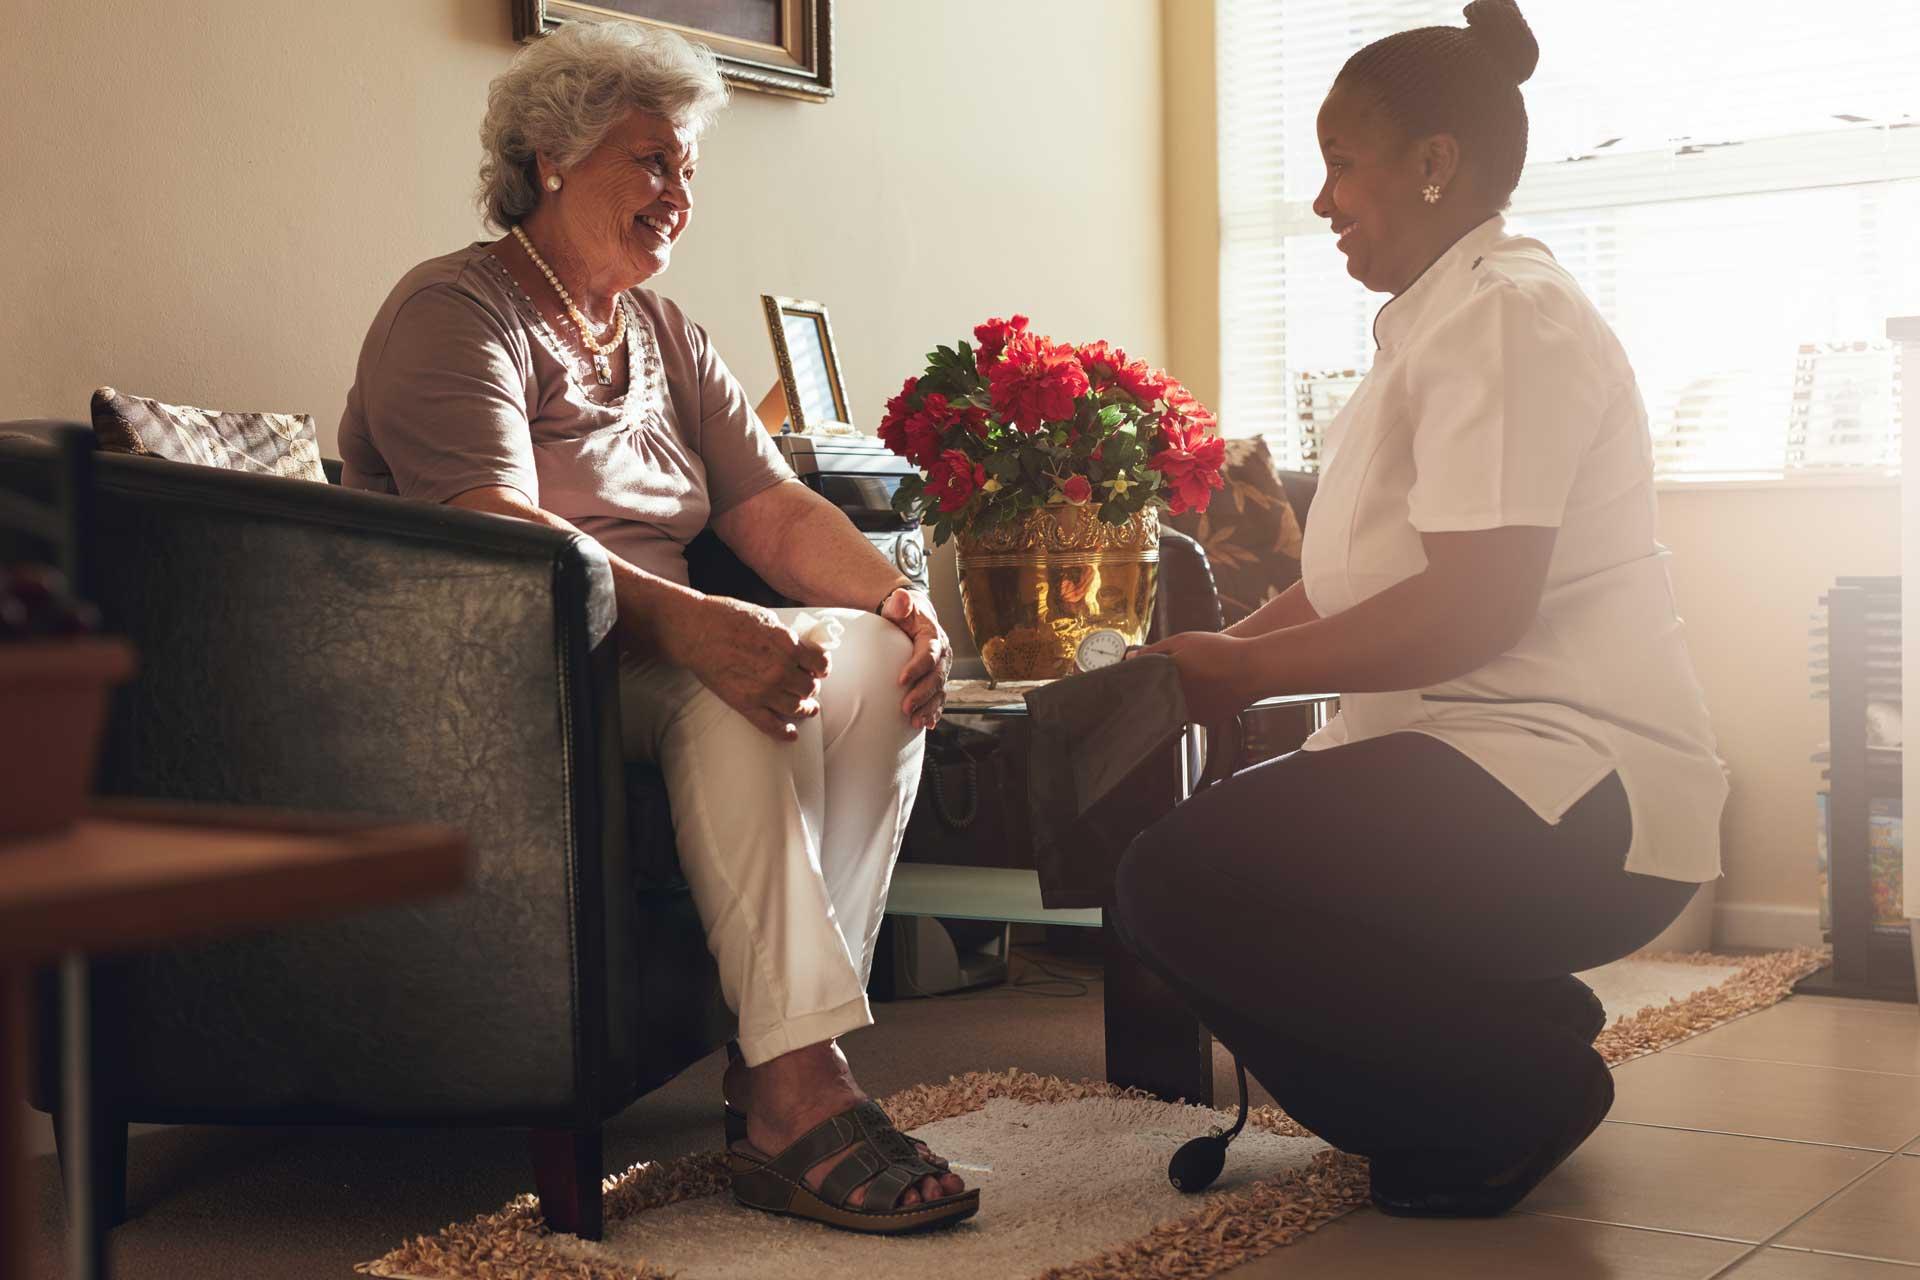 Elderly Insurance at Kohlnhofer Insurance Agency